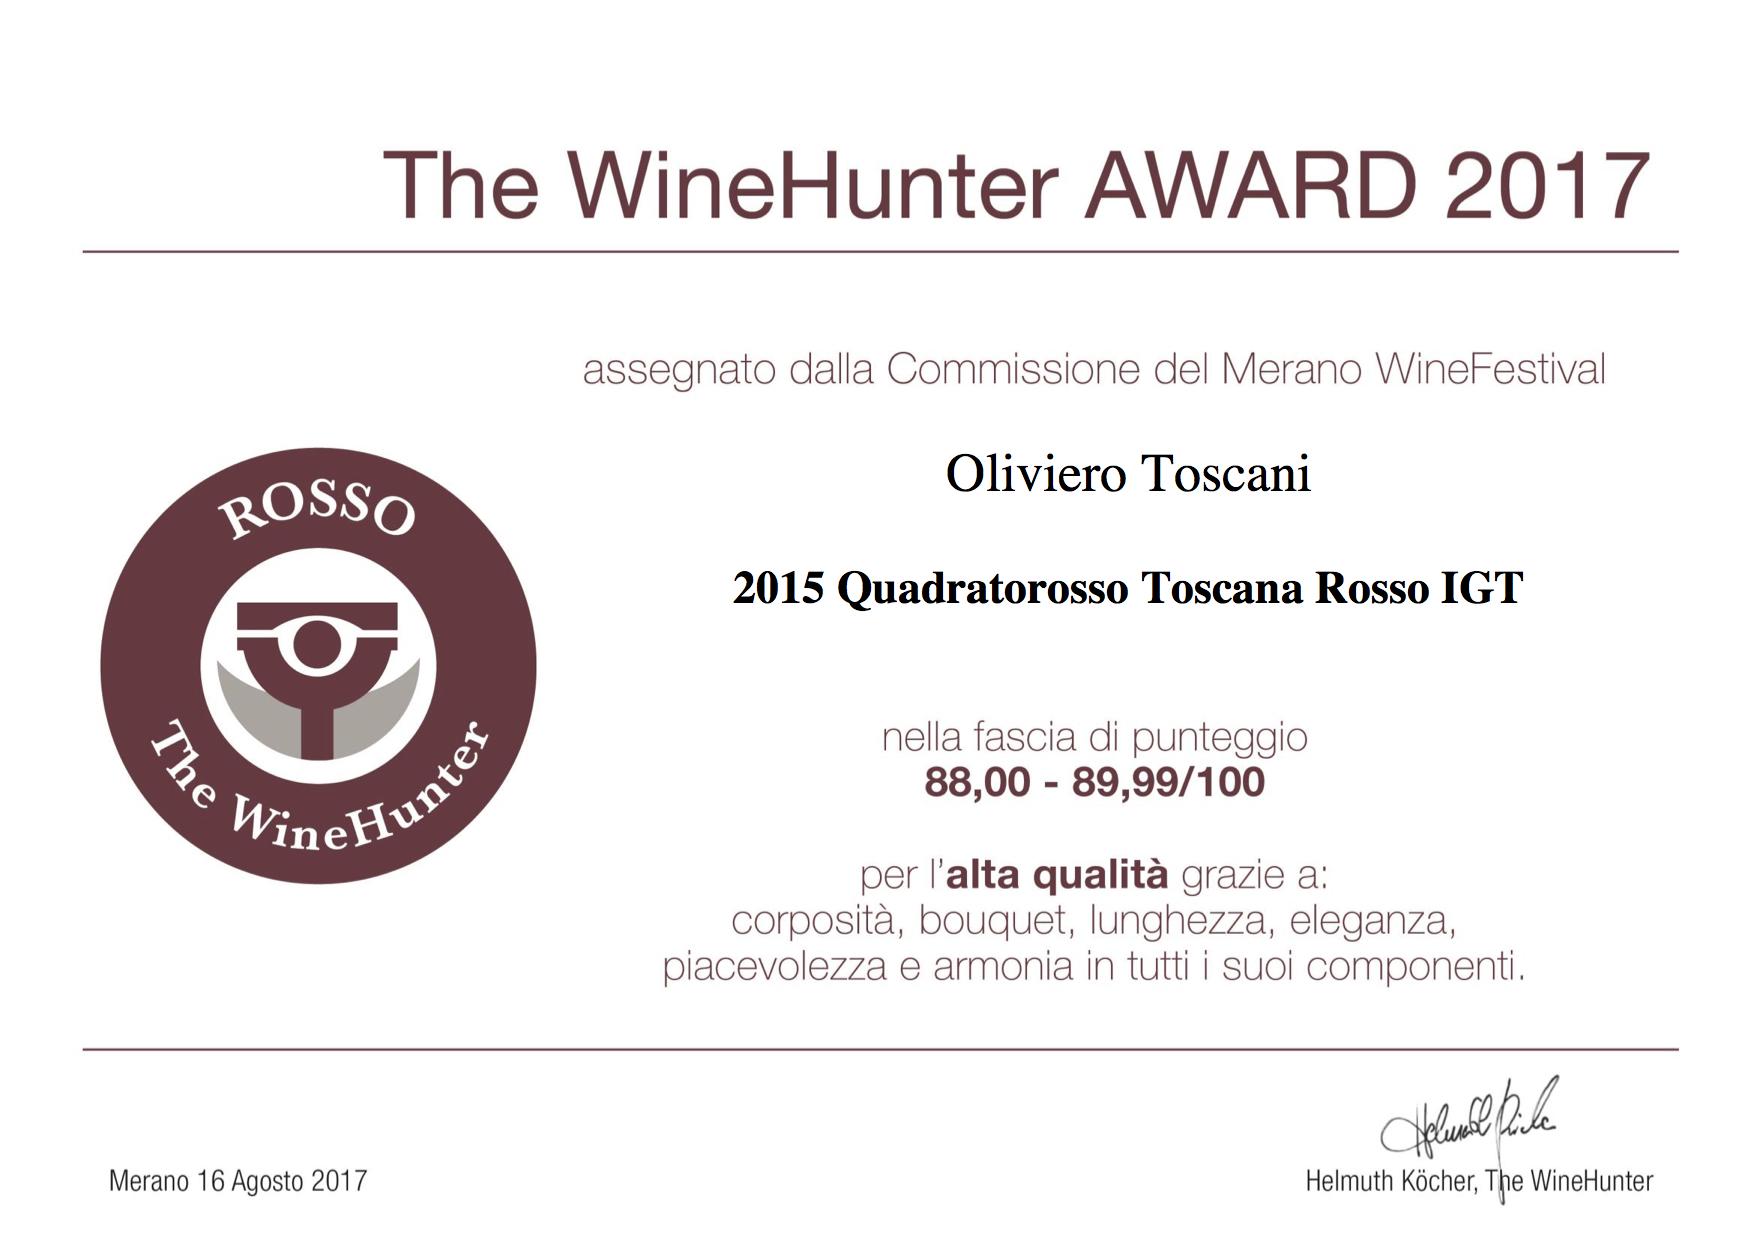 The WineHunter Award  Rosso-1305170817.jpg